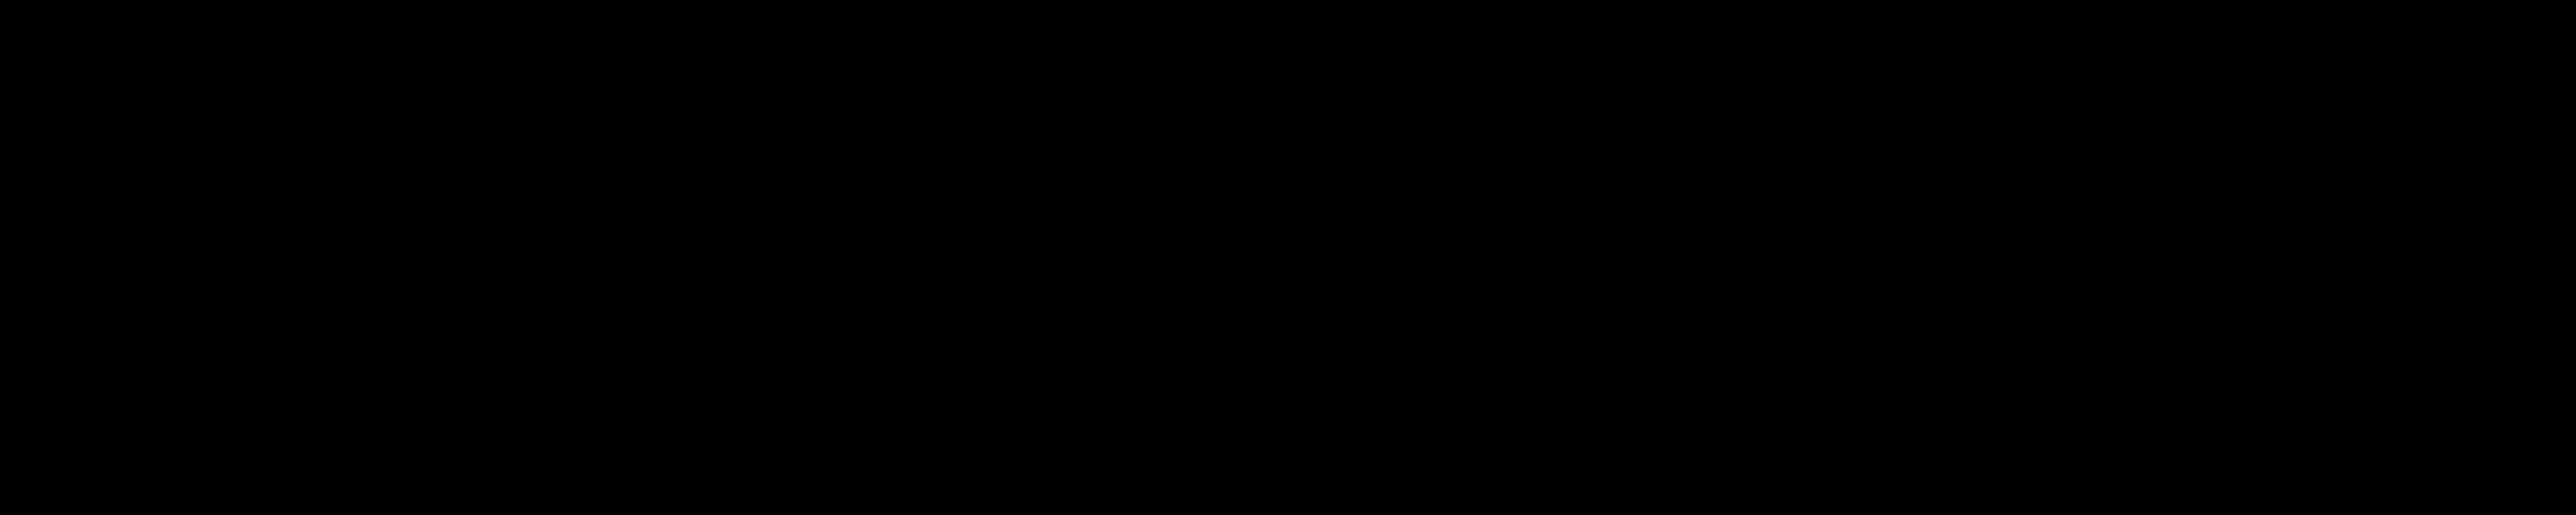 logo Koonekt